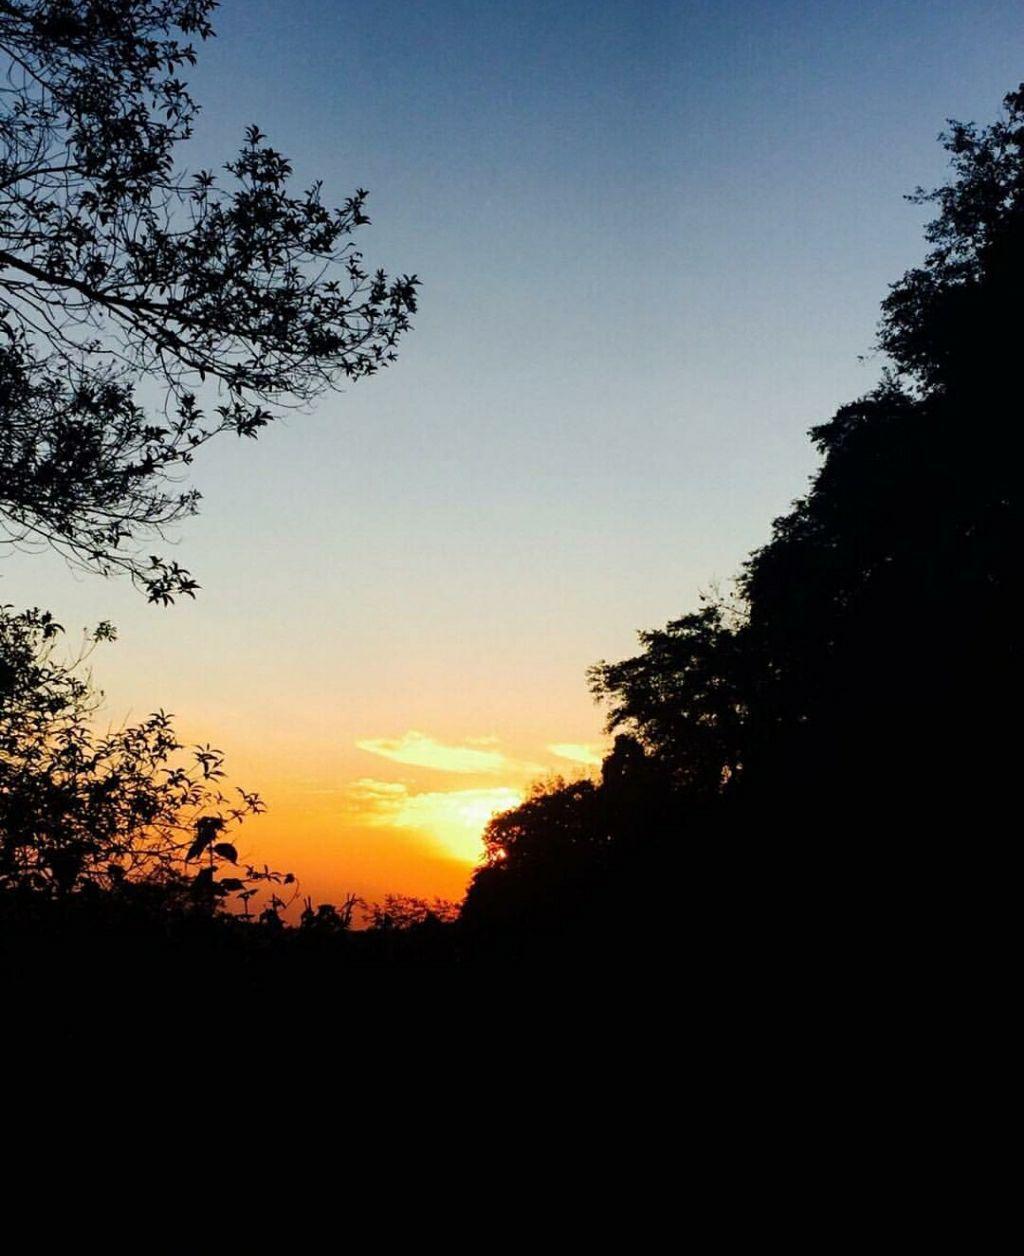 Photo of Tiger Hill Sunrise Observatory By Shireena Jose